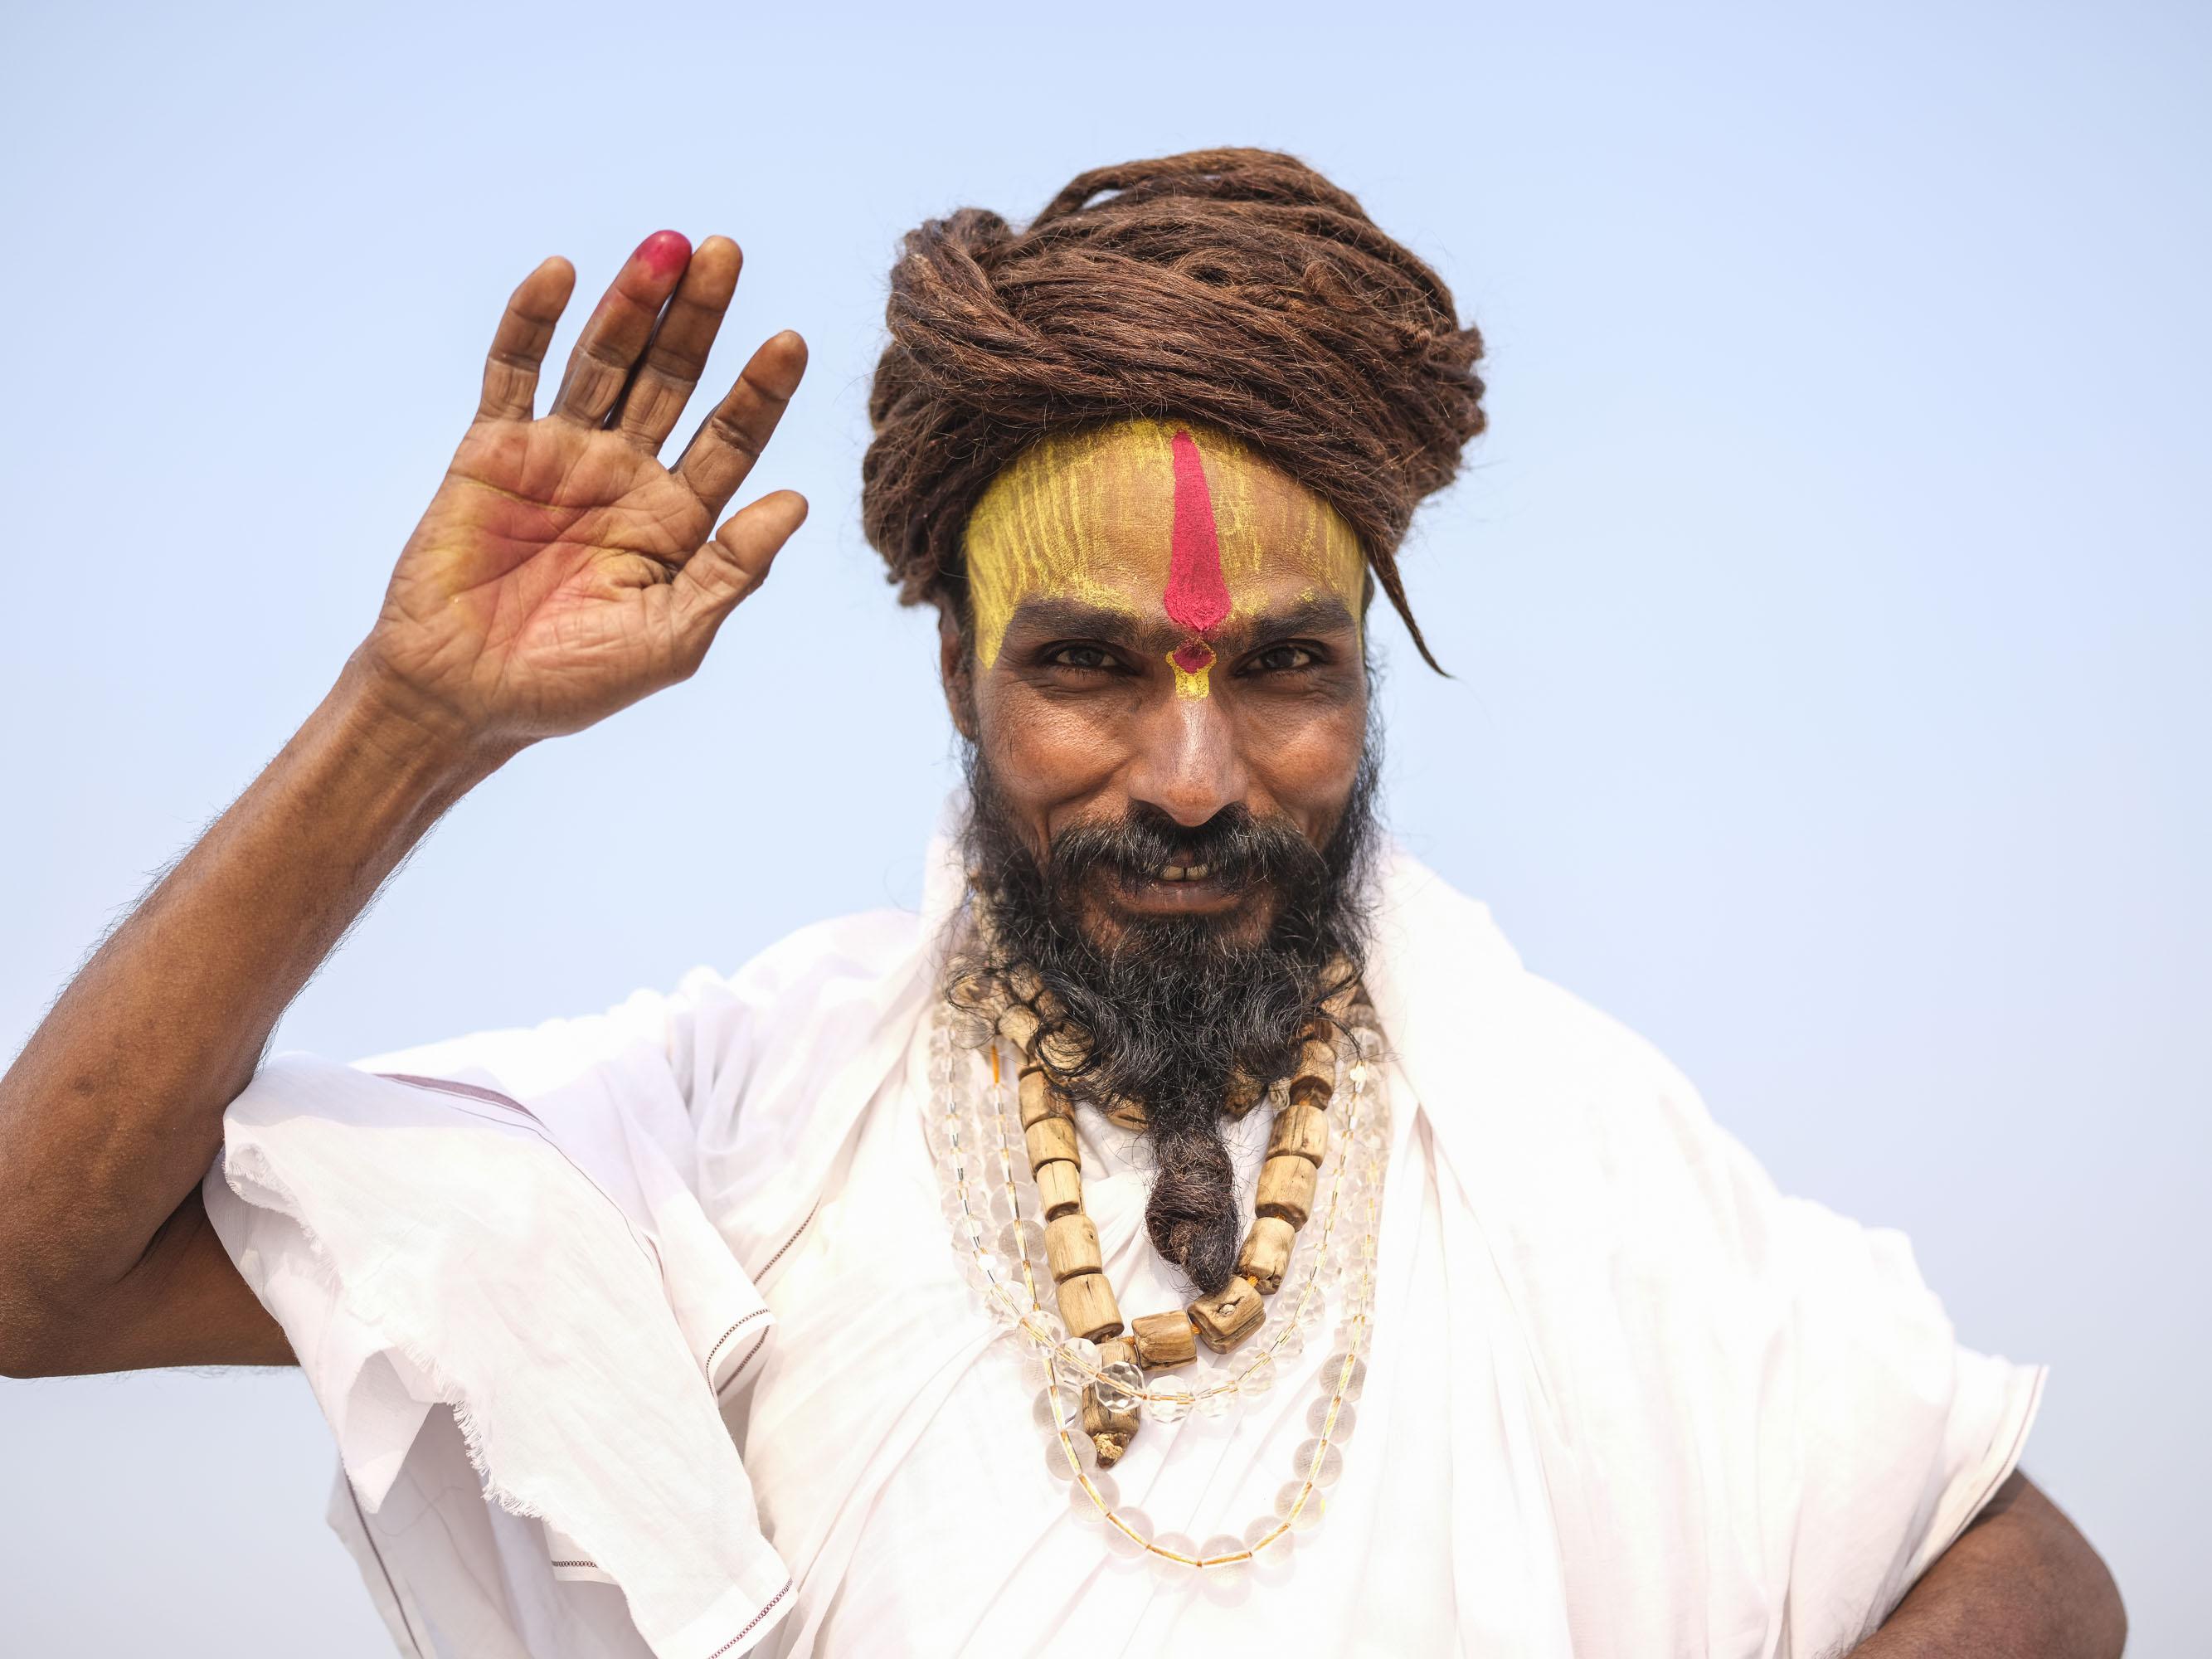 rasta man baba young pilgrims Kumbh mela 2019 India Allahabad Prayagraj Ardh hindu religious Festival event rivers photographer jose jeuland photography